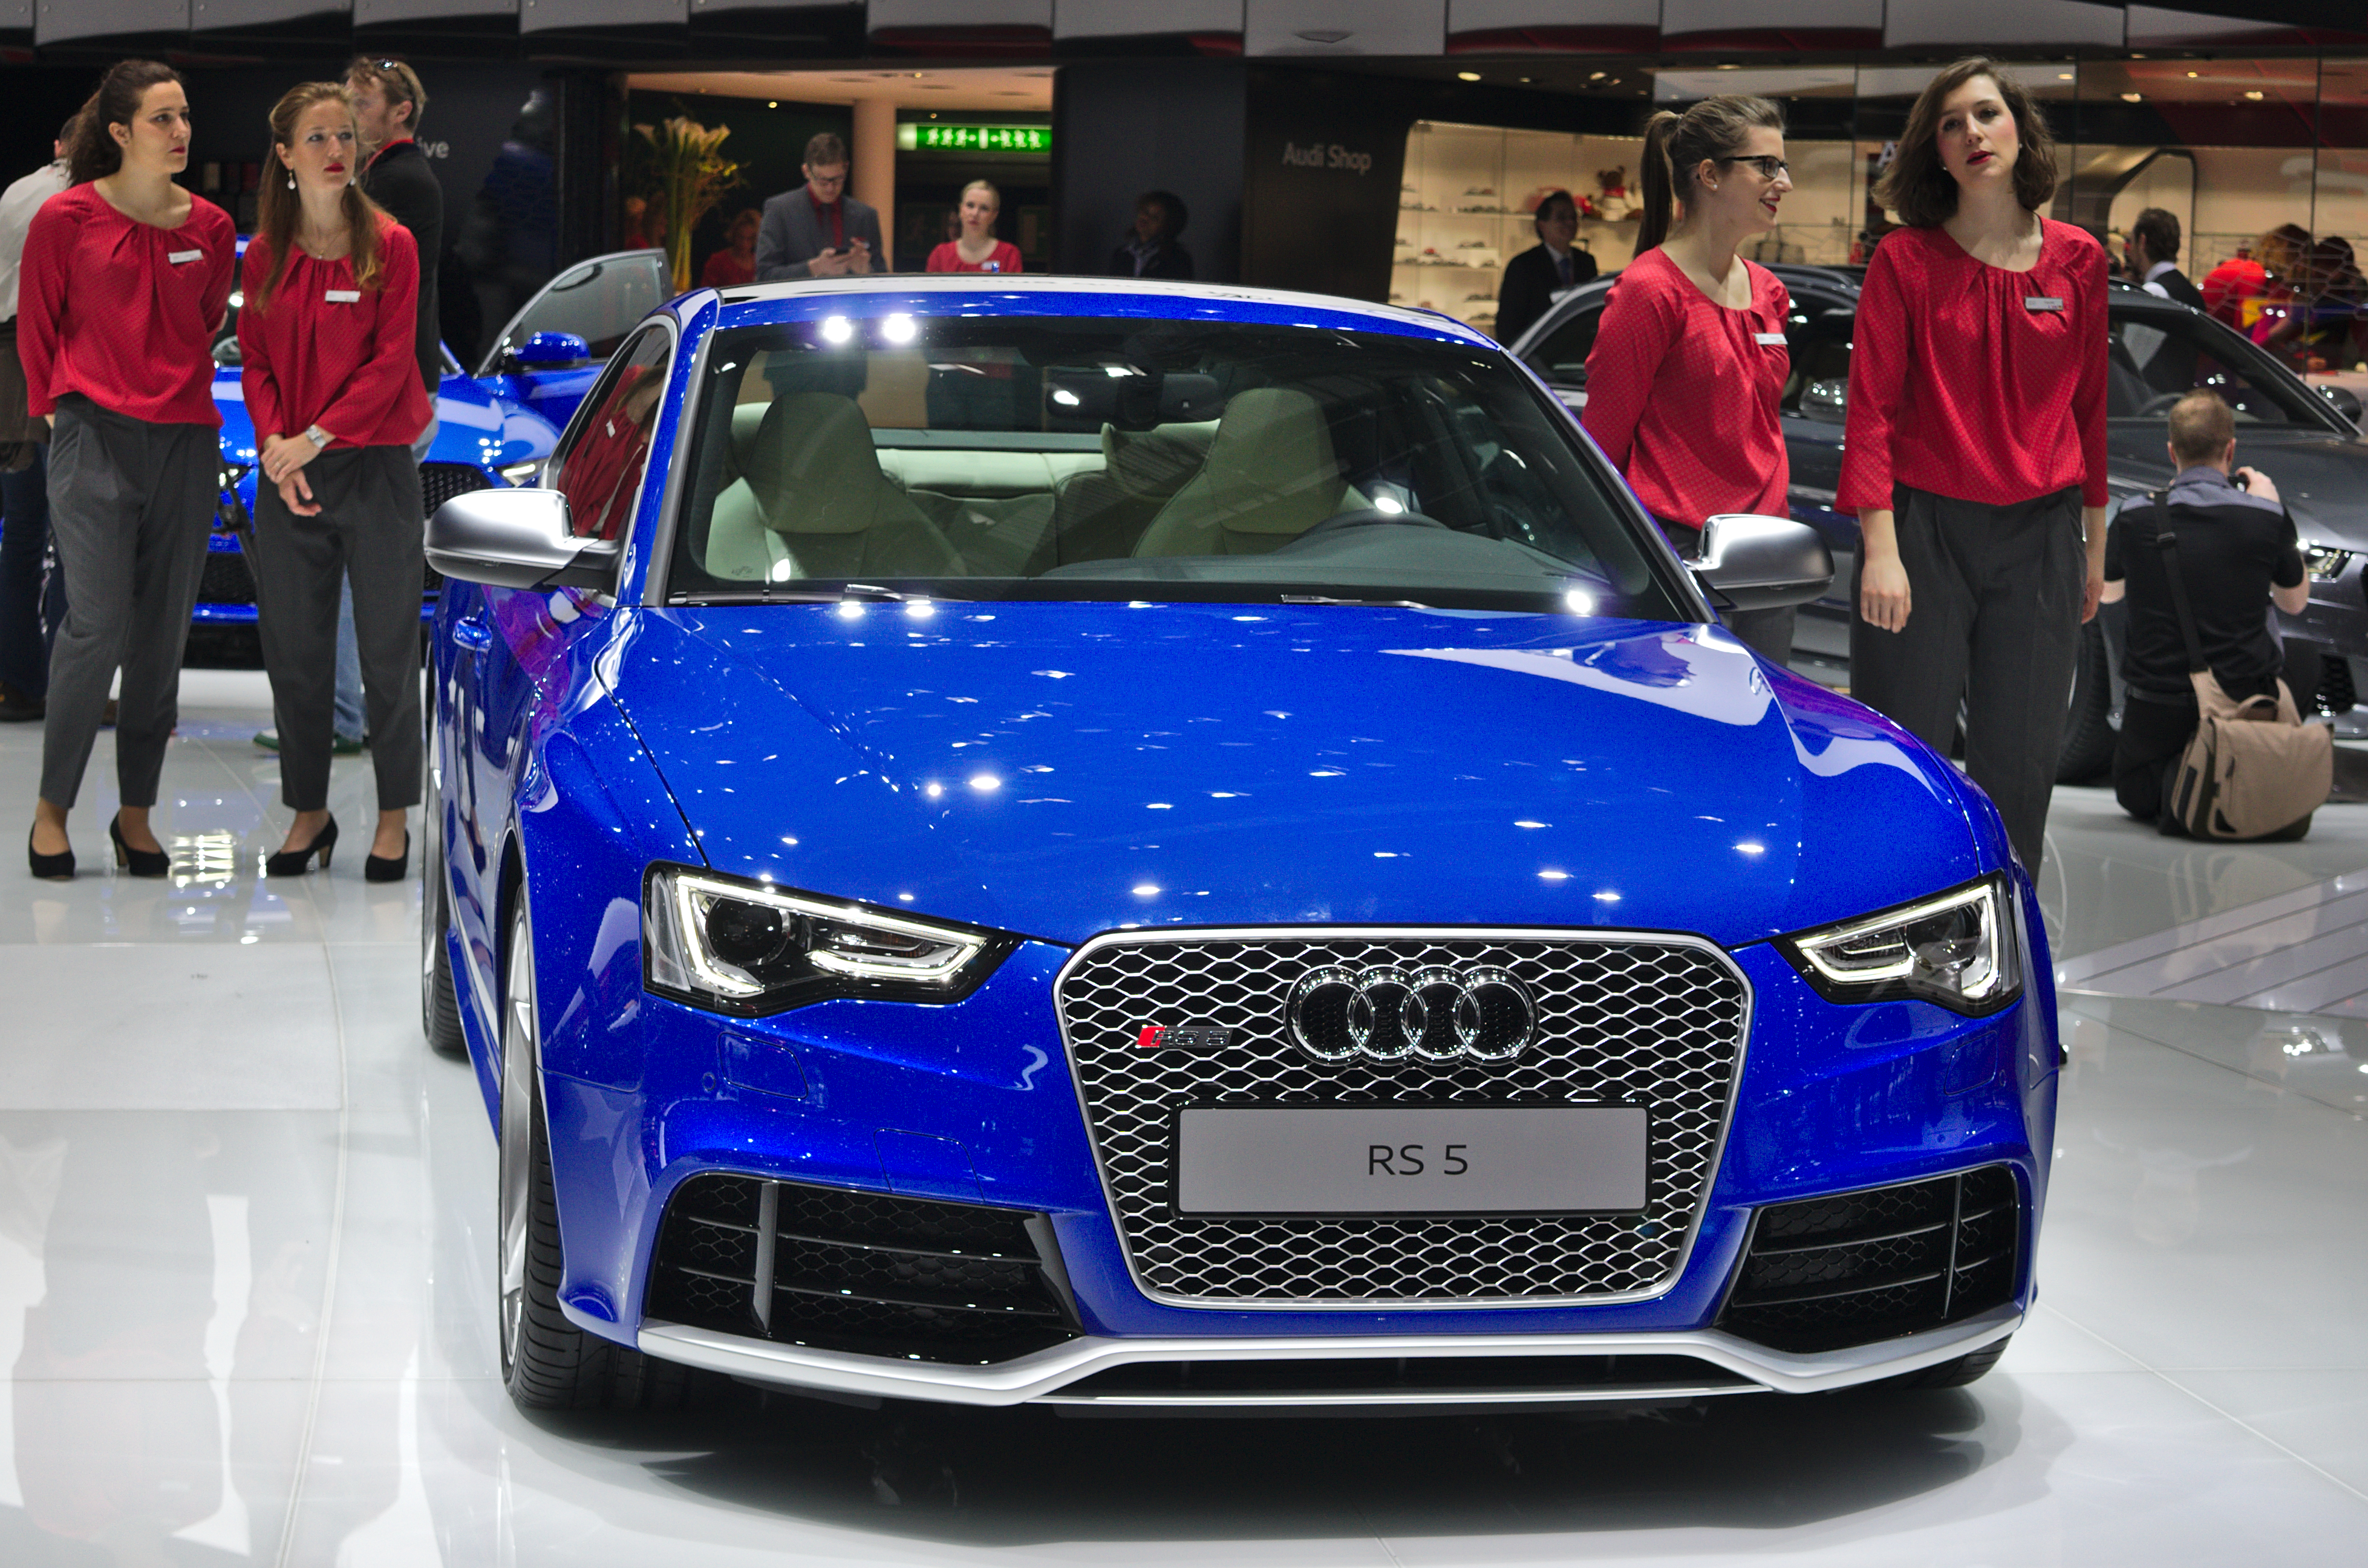 Audi rs5 wiki english 4